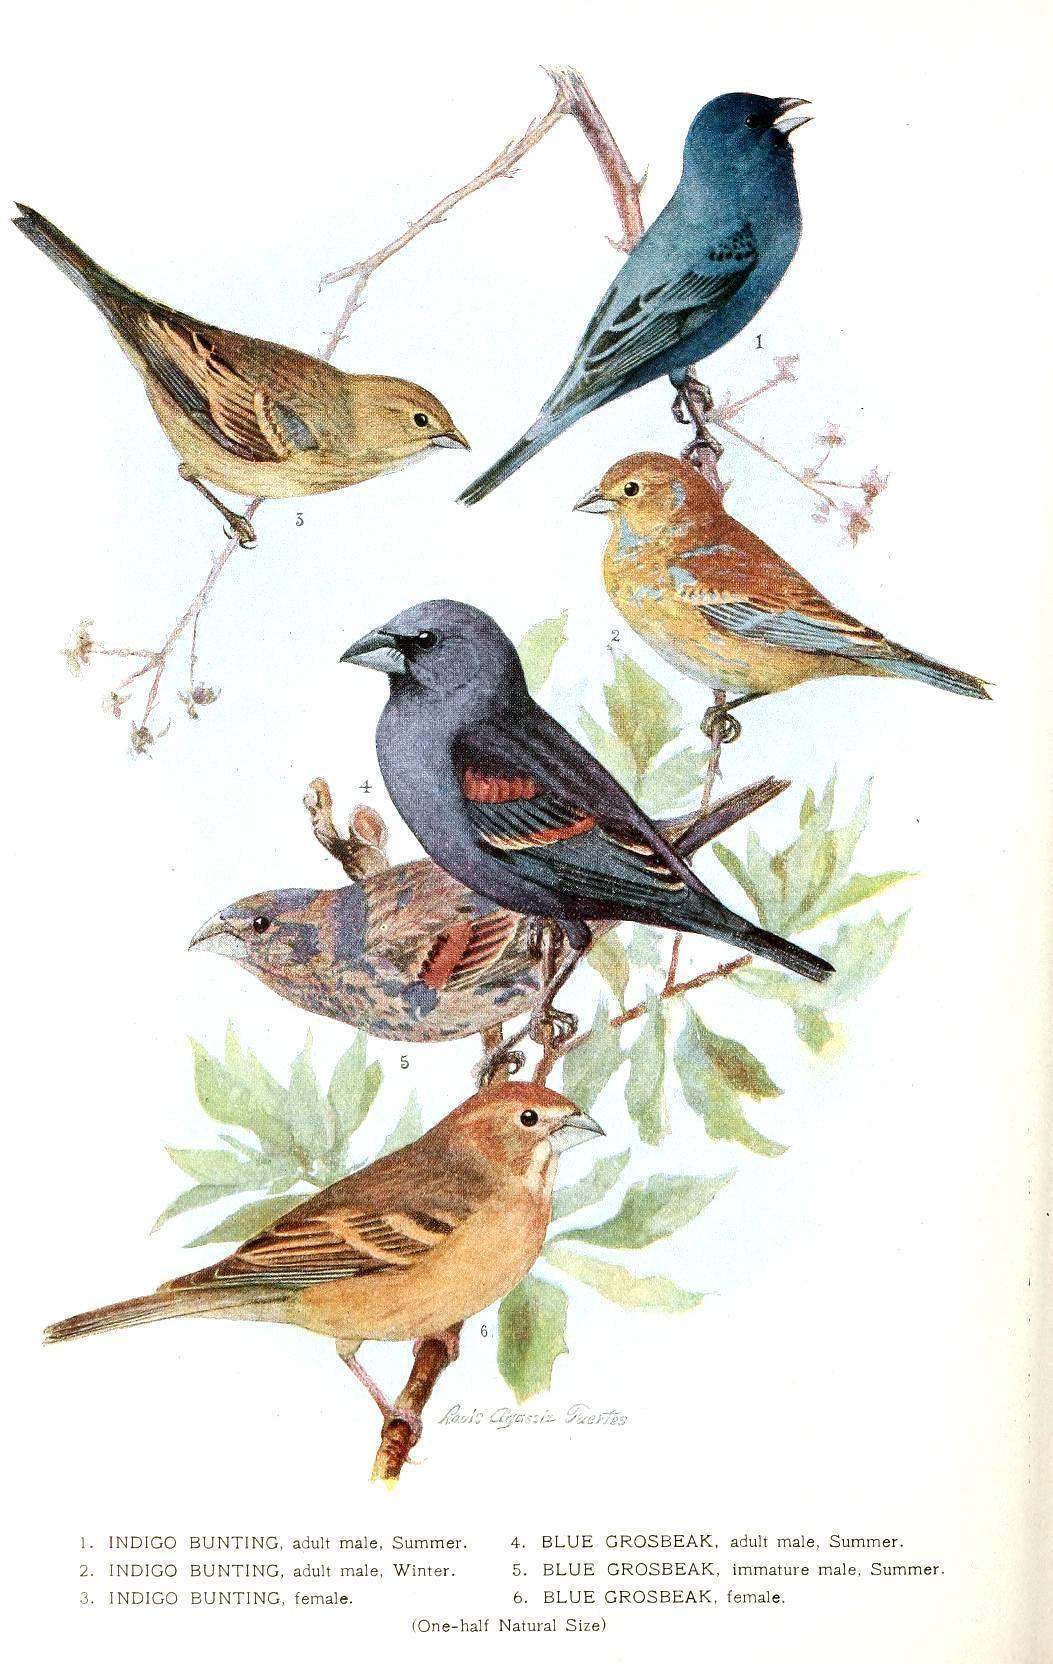 Free Printable - Bird - Indigo Grossbeak | Birds & Cages | Vintage - Free Printable Images Of Birds